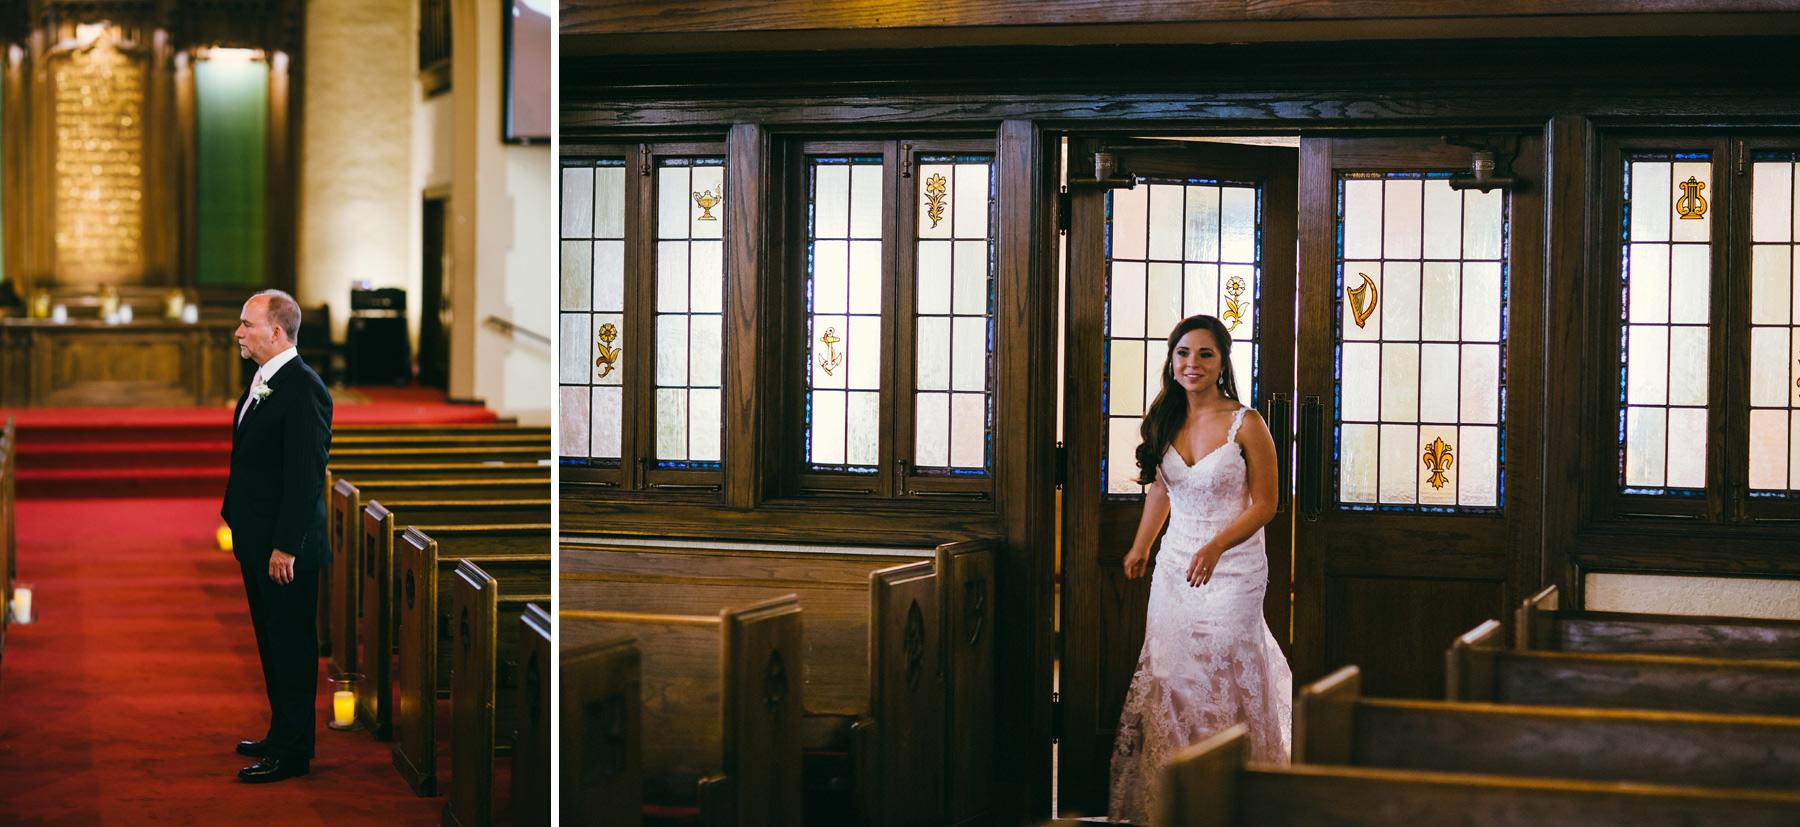 Kansas City Summer Wedding at the Guild_Kindling Wedding Photography Blog44.JPG